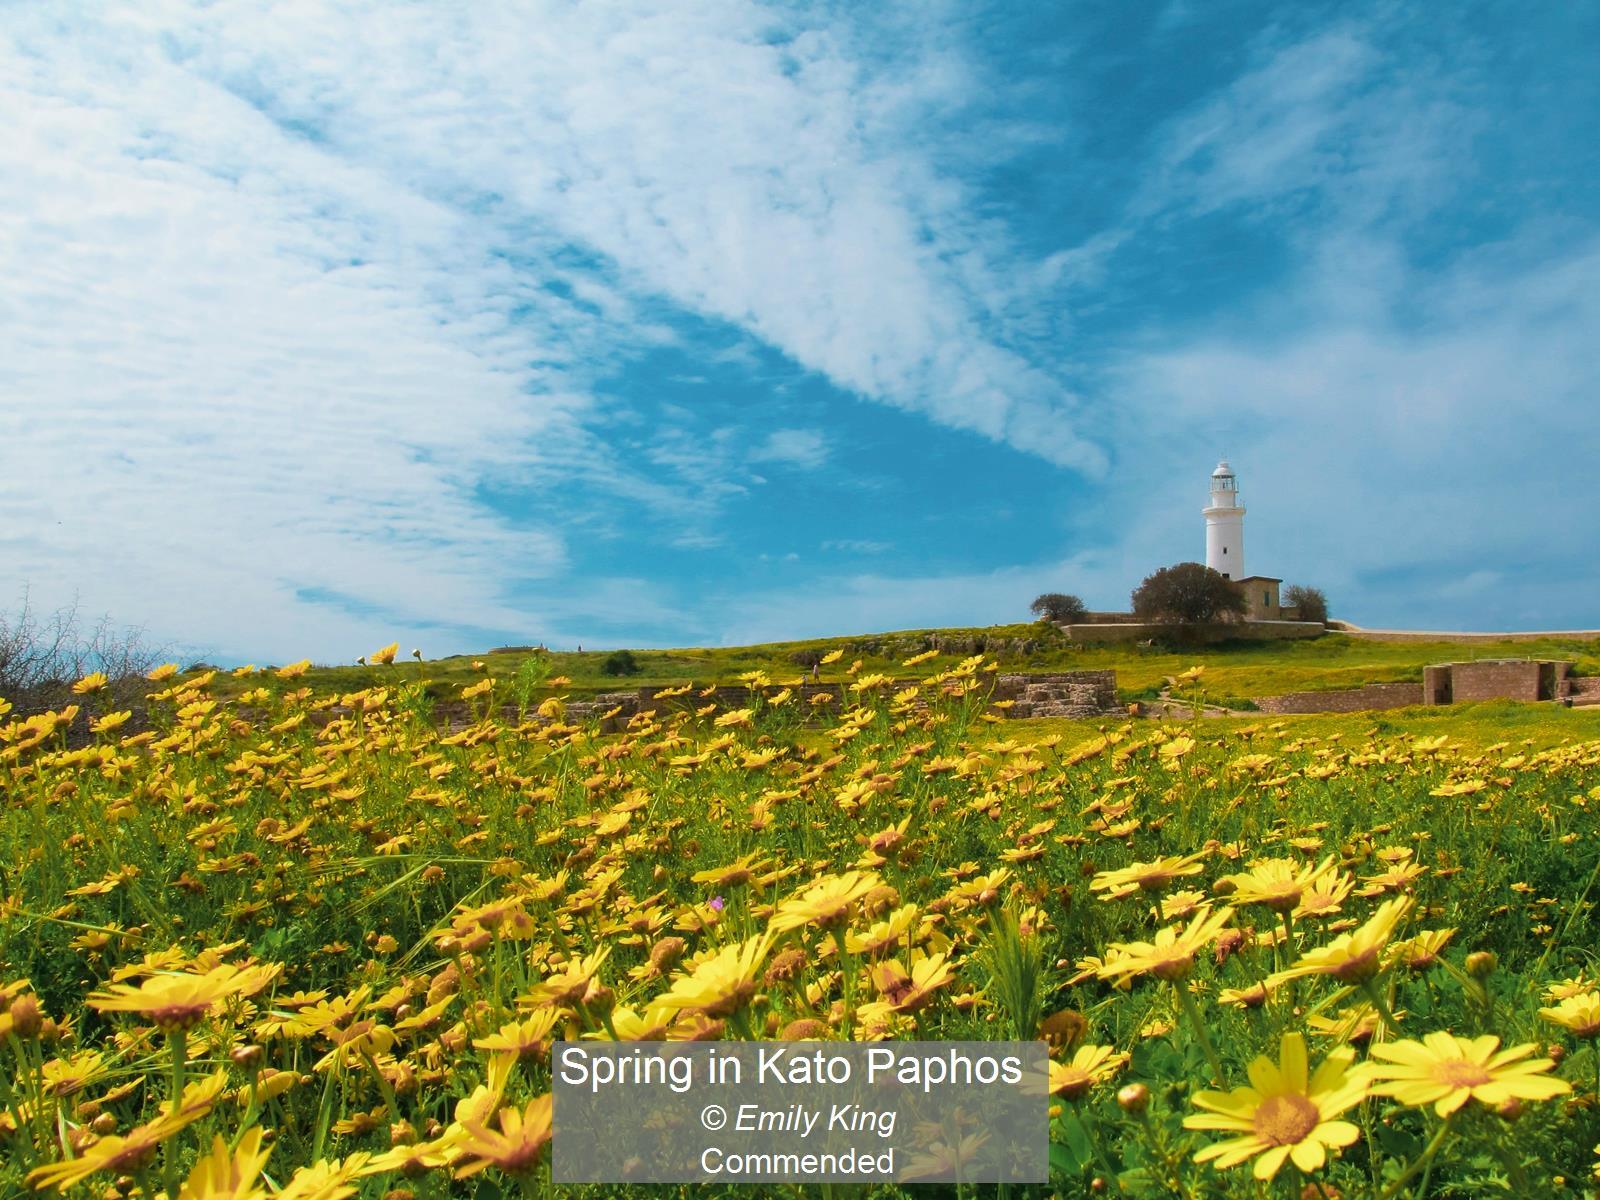 Spring in Kato Paphos_Emily King_Comm